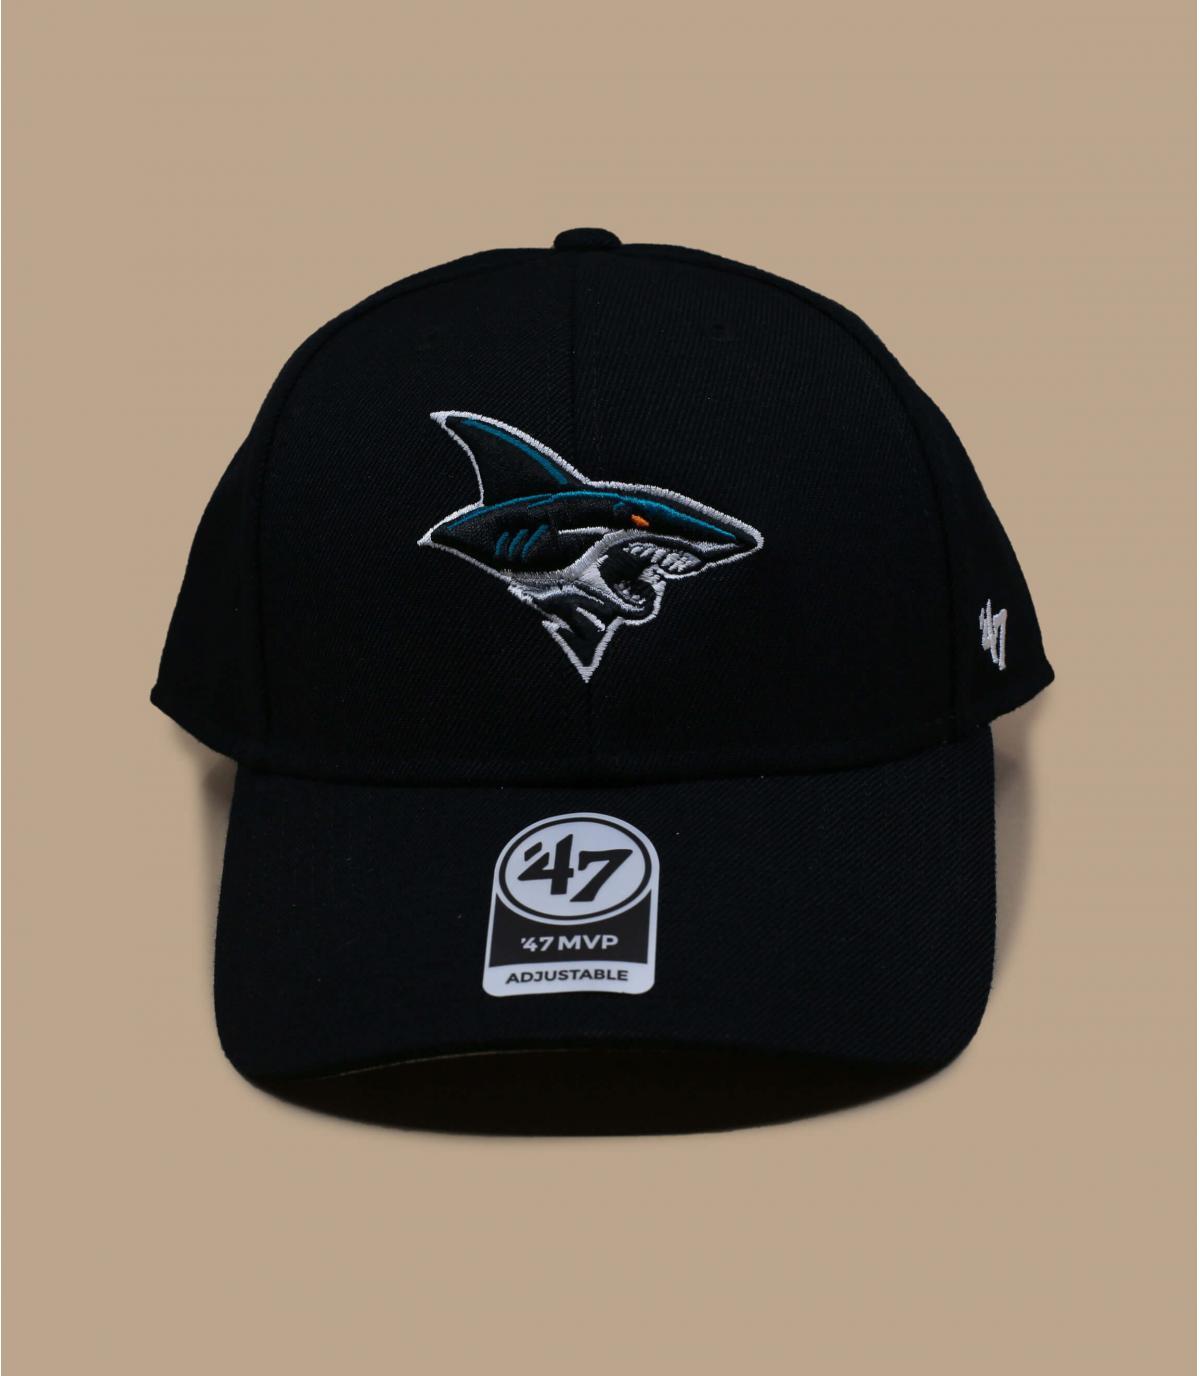 Détails MVP San Jose Sharks - image 2